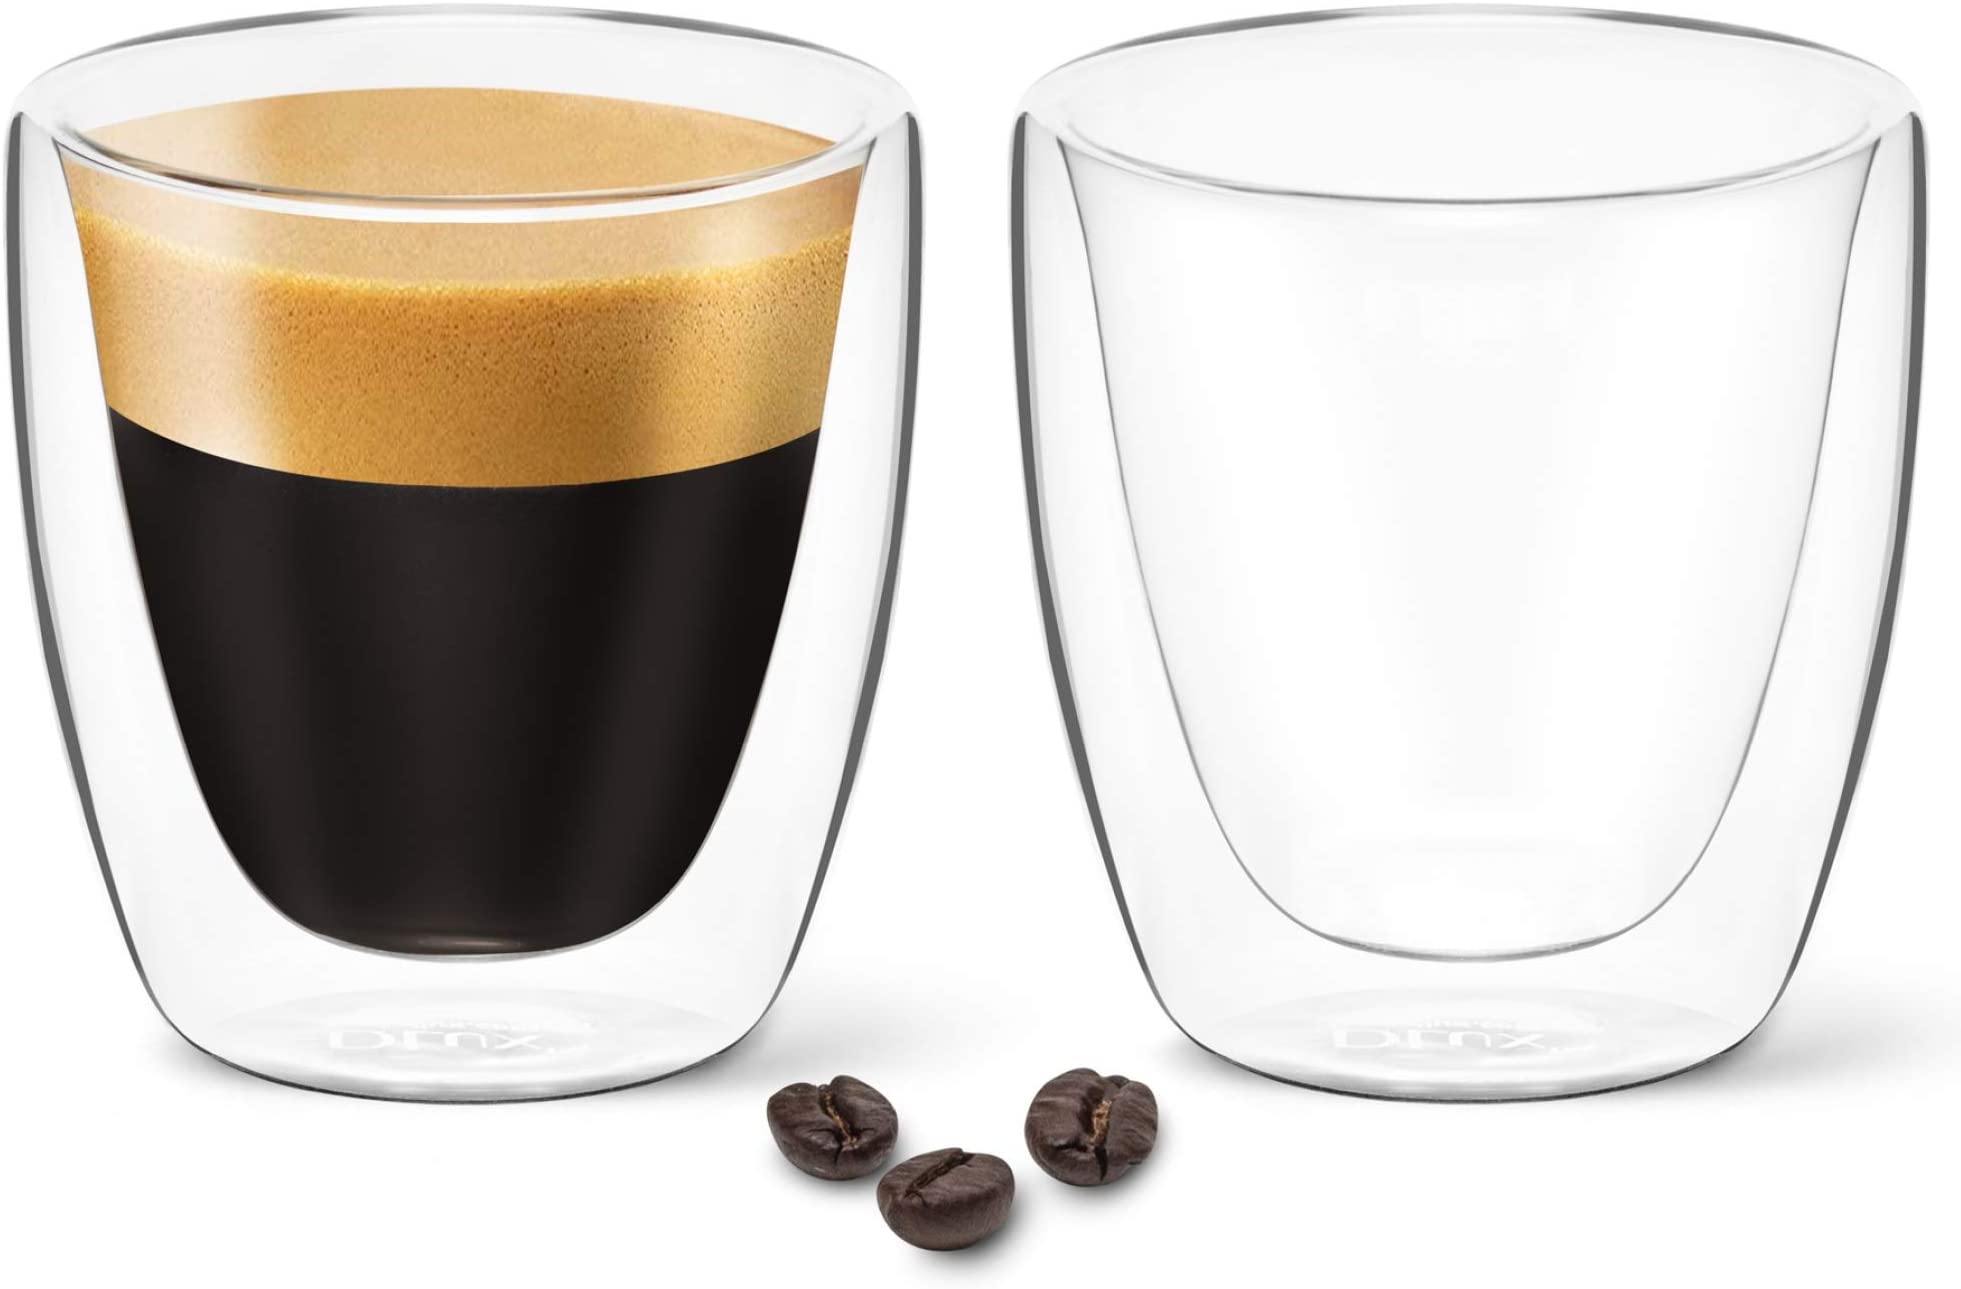 DLux Espresso Coffee Cups 3oz, Double Wall, Clear Glass set of 2 Glasses, Insulated Borosilicate Glassware Tea Cup mug